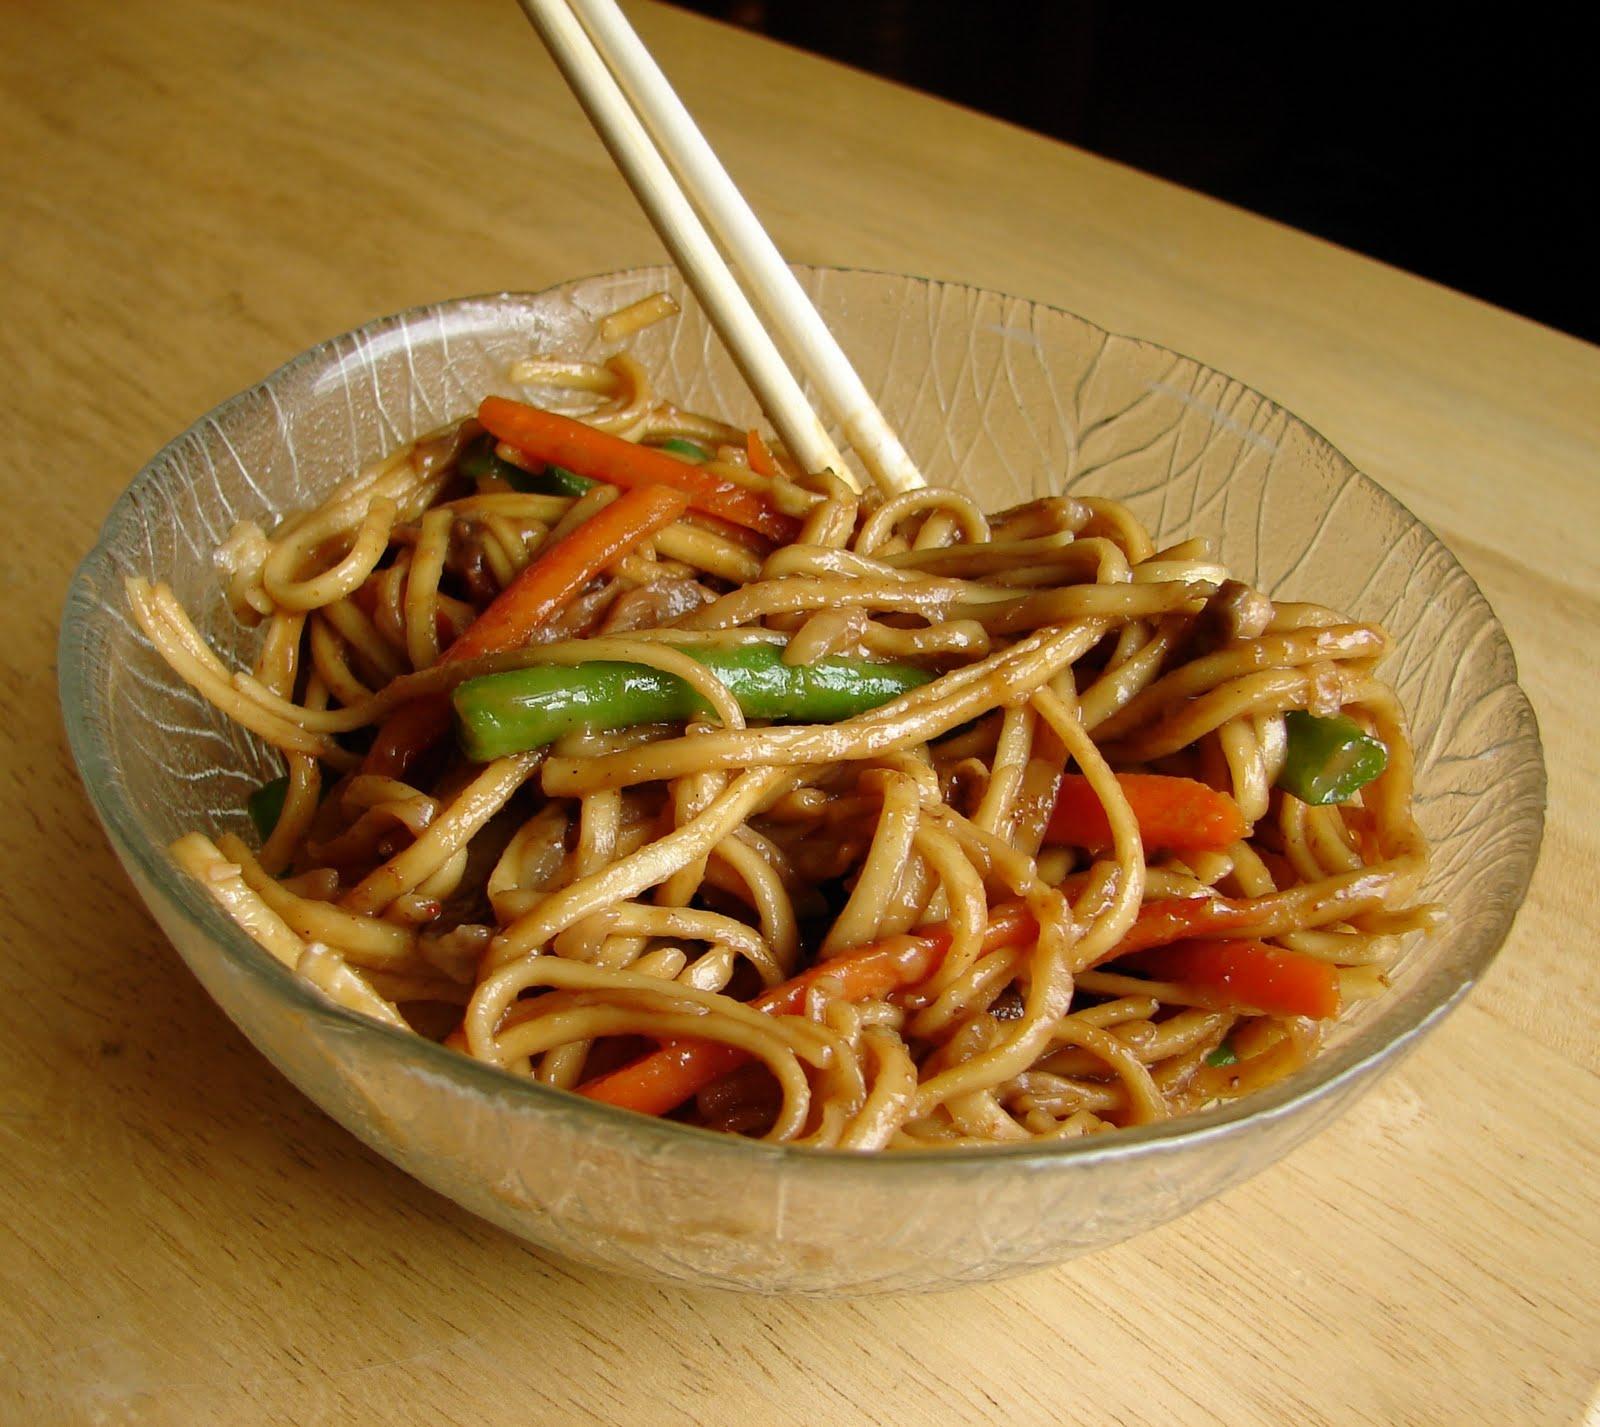 Nummy Kitchen: Giada's Vegetable Chow Mein